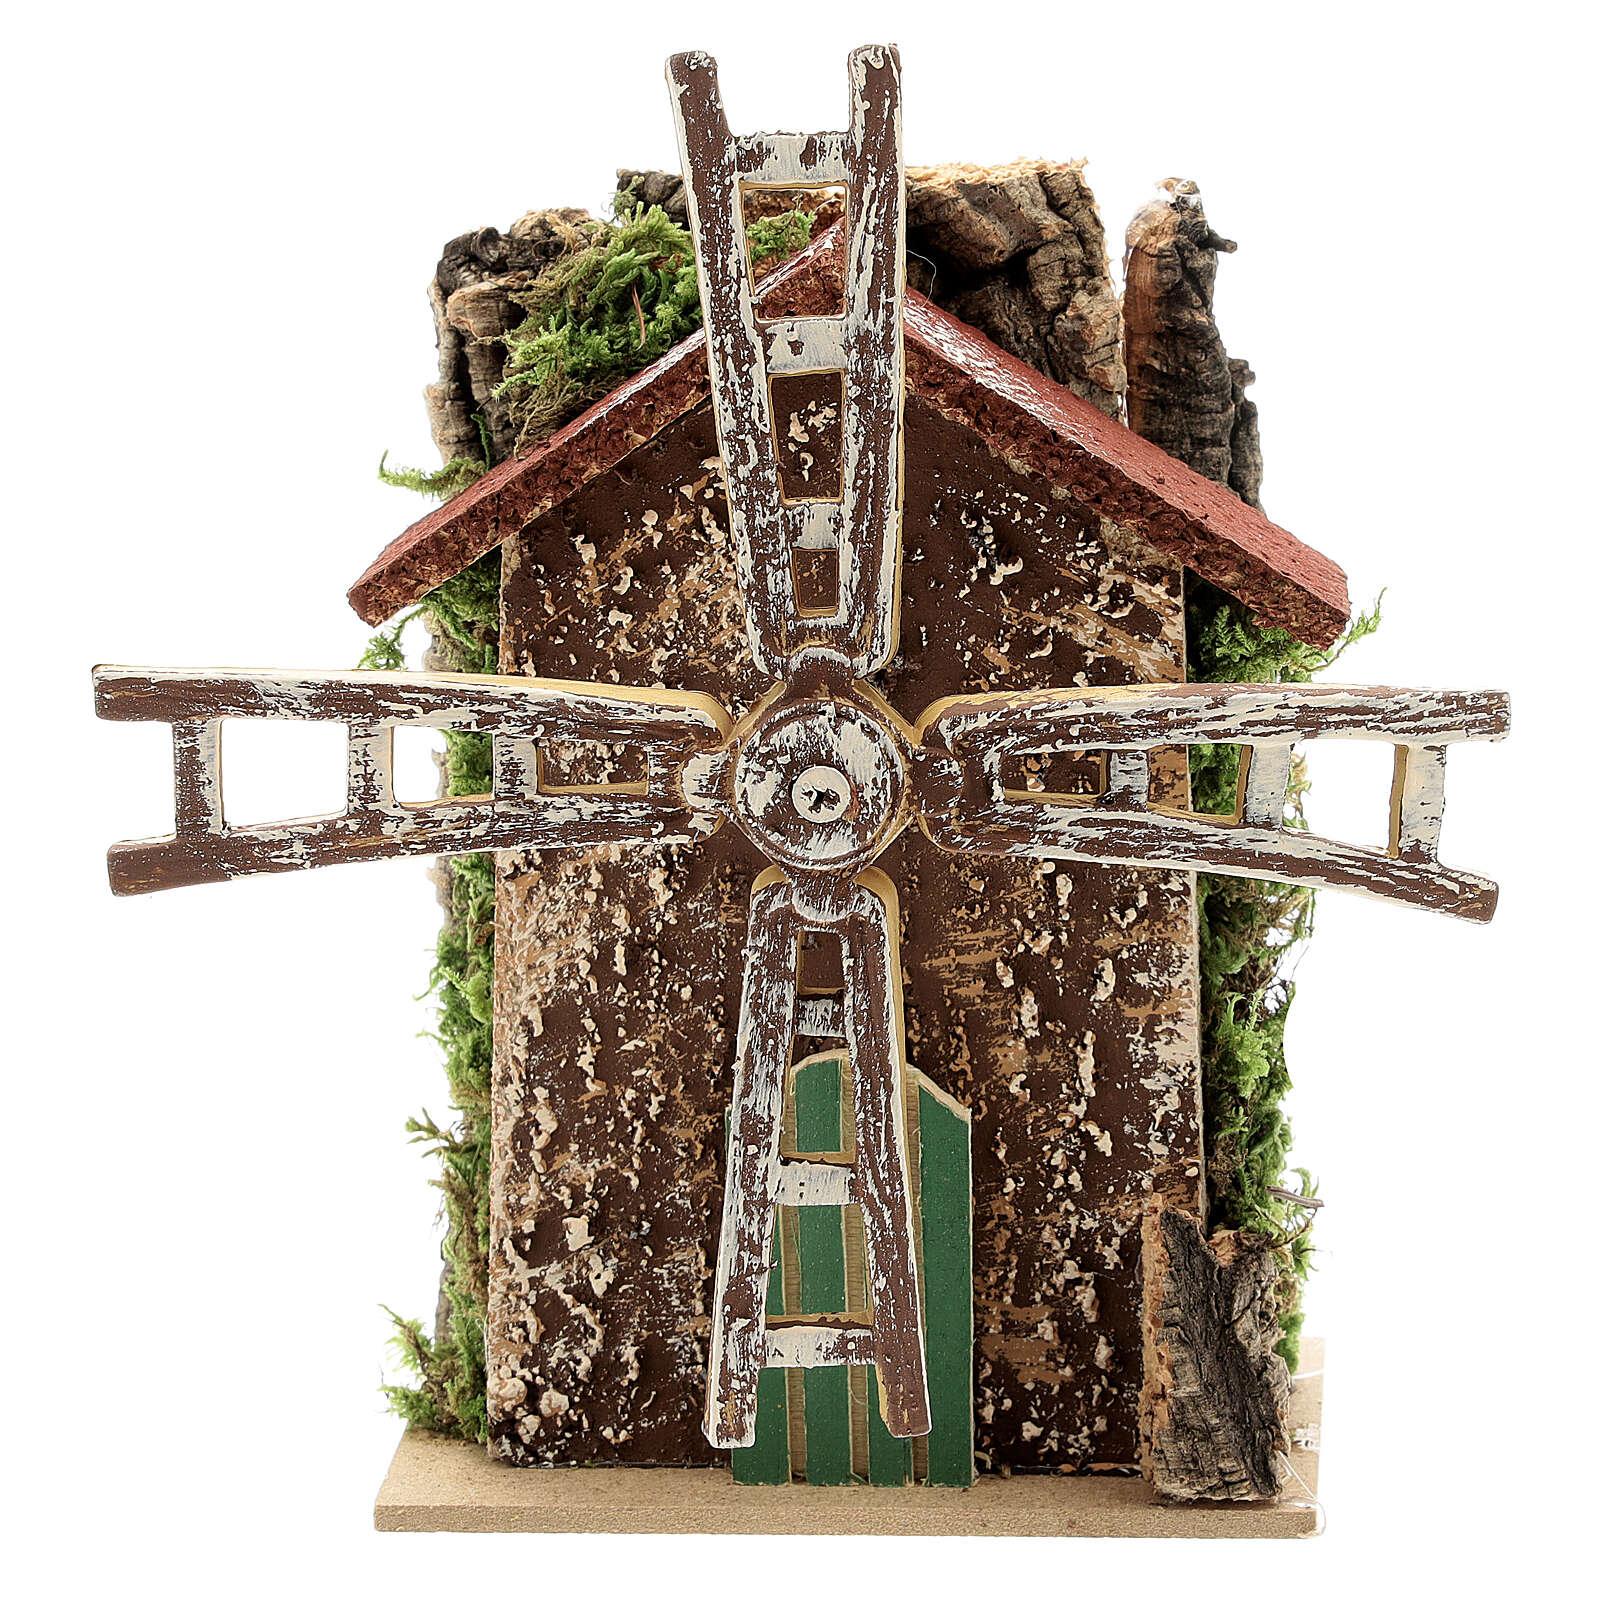 Functioning windmill figurine, 10x5x15 cm 4